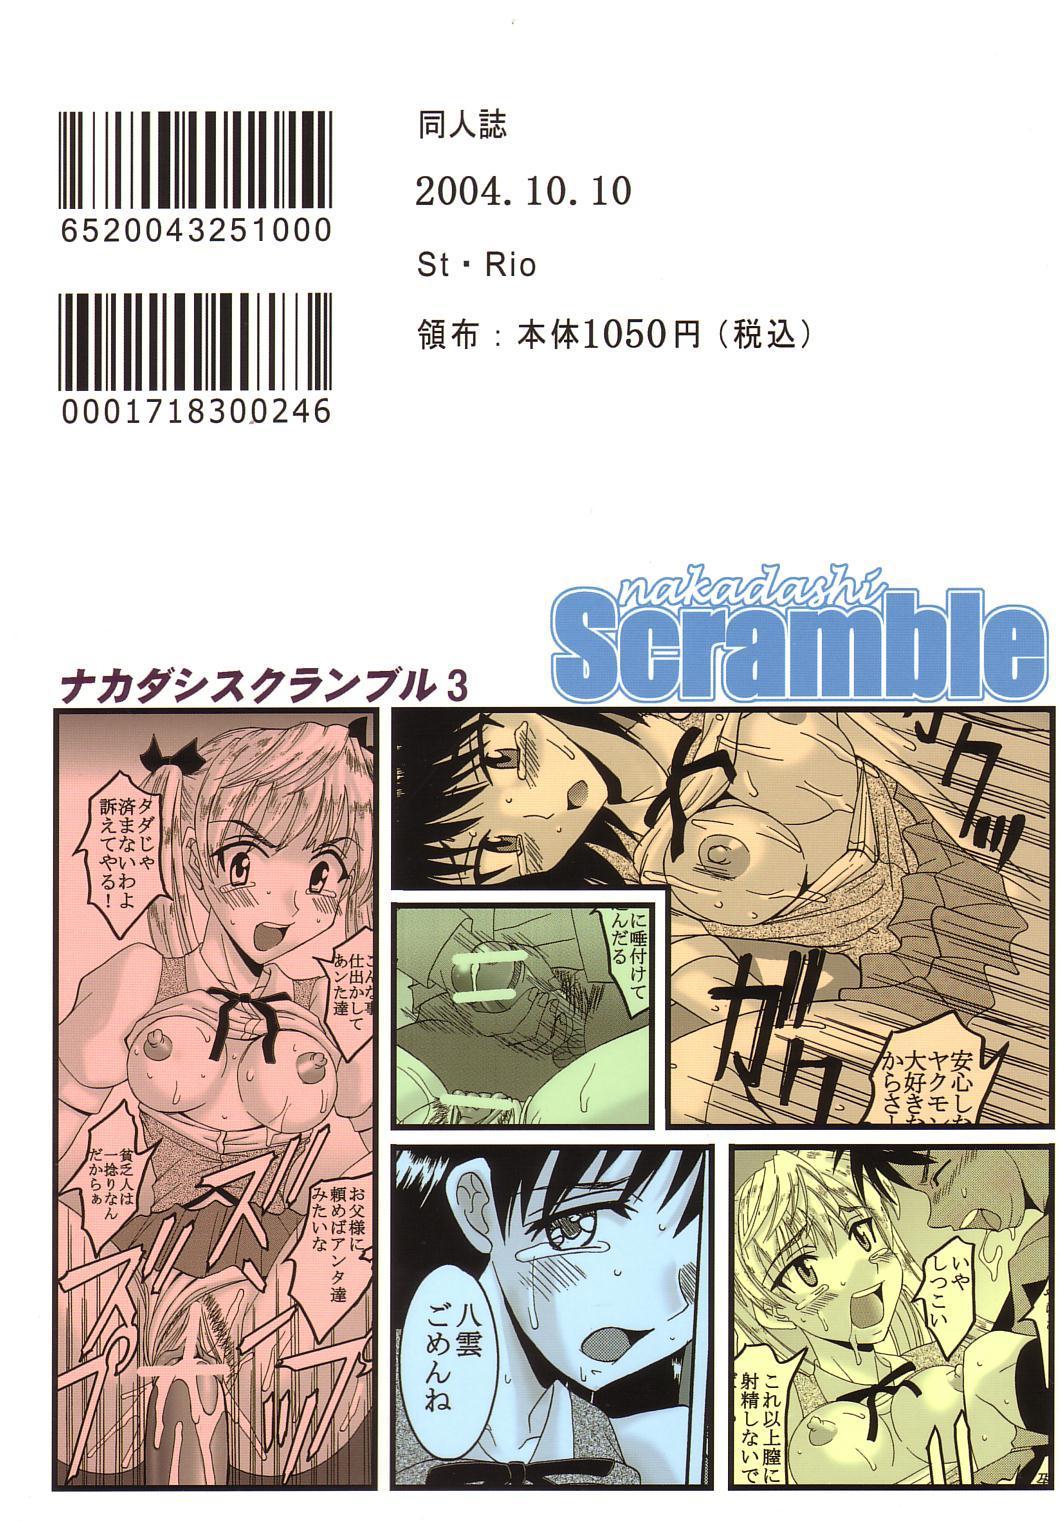 Nakadashi Scramble 3 53